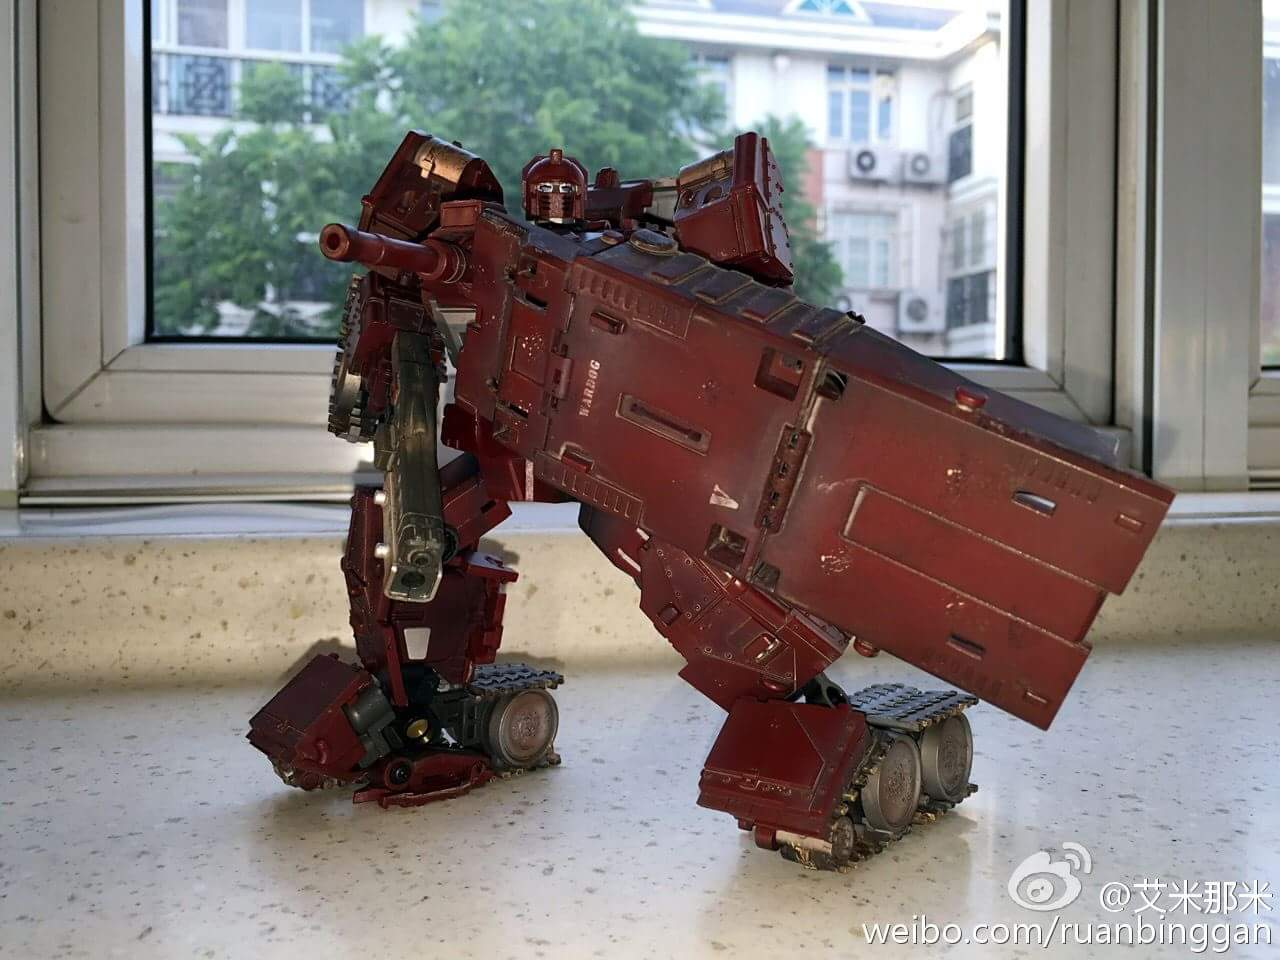 [BadCube] Produit Tiers - Minibots MP - Gamme OTS - Page 4 LzP3QdaF